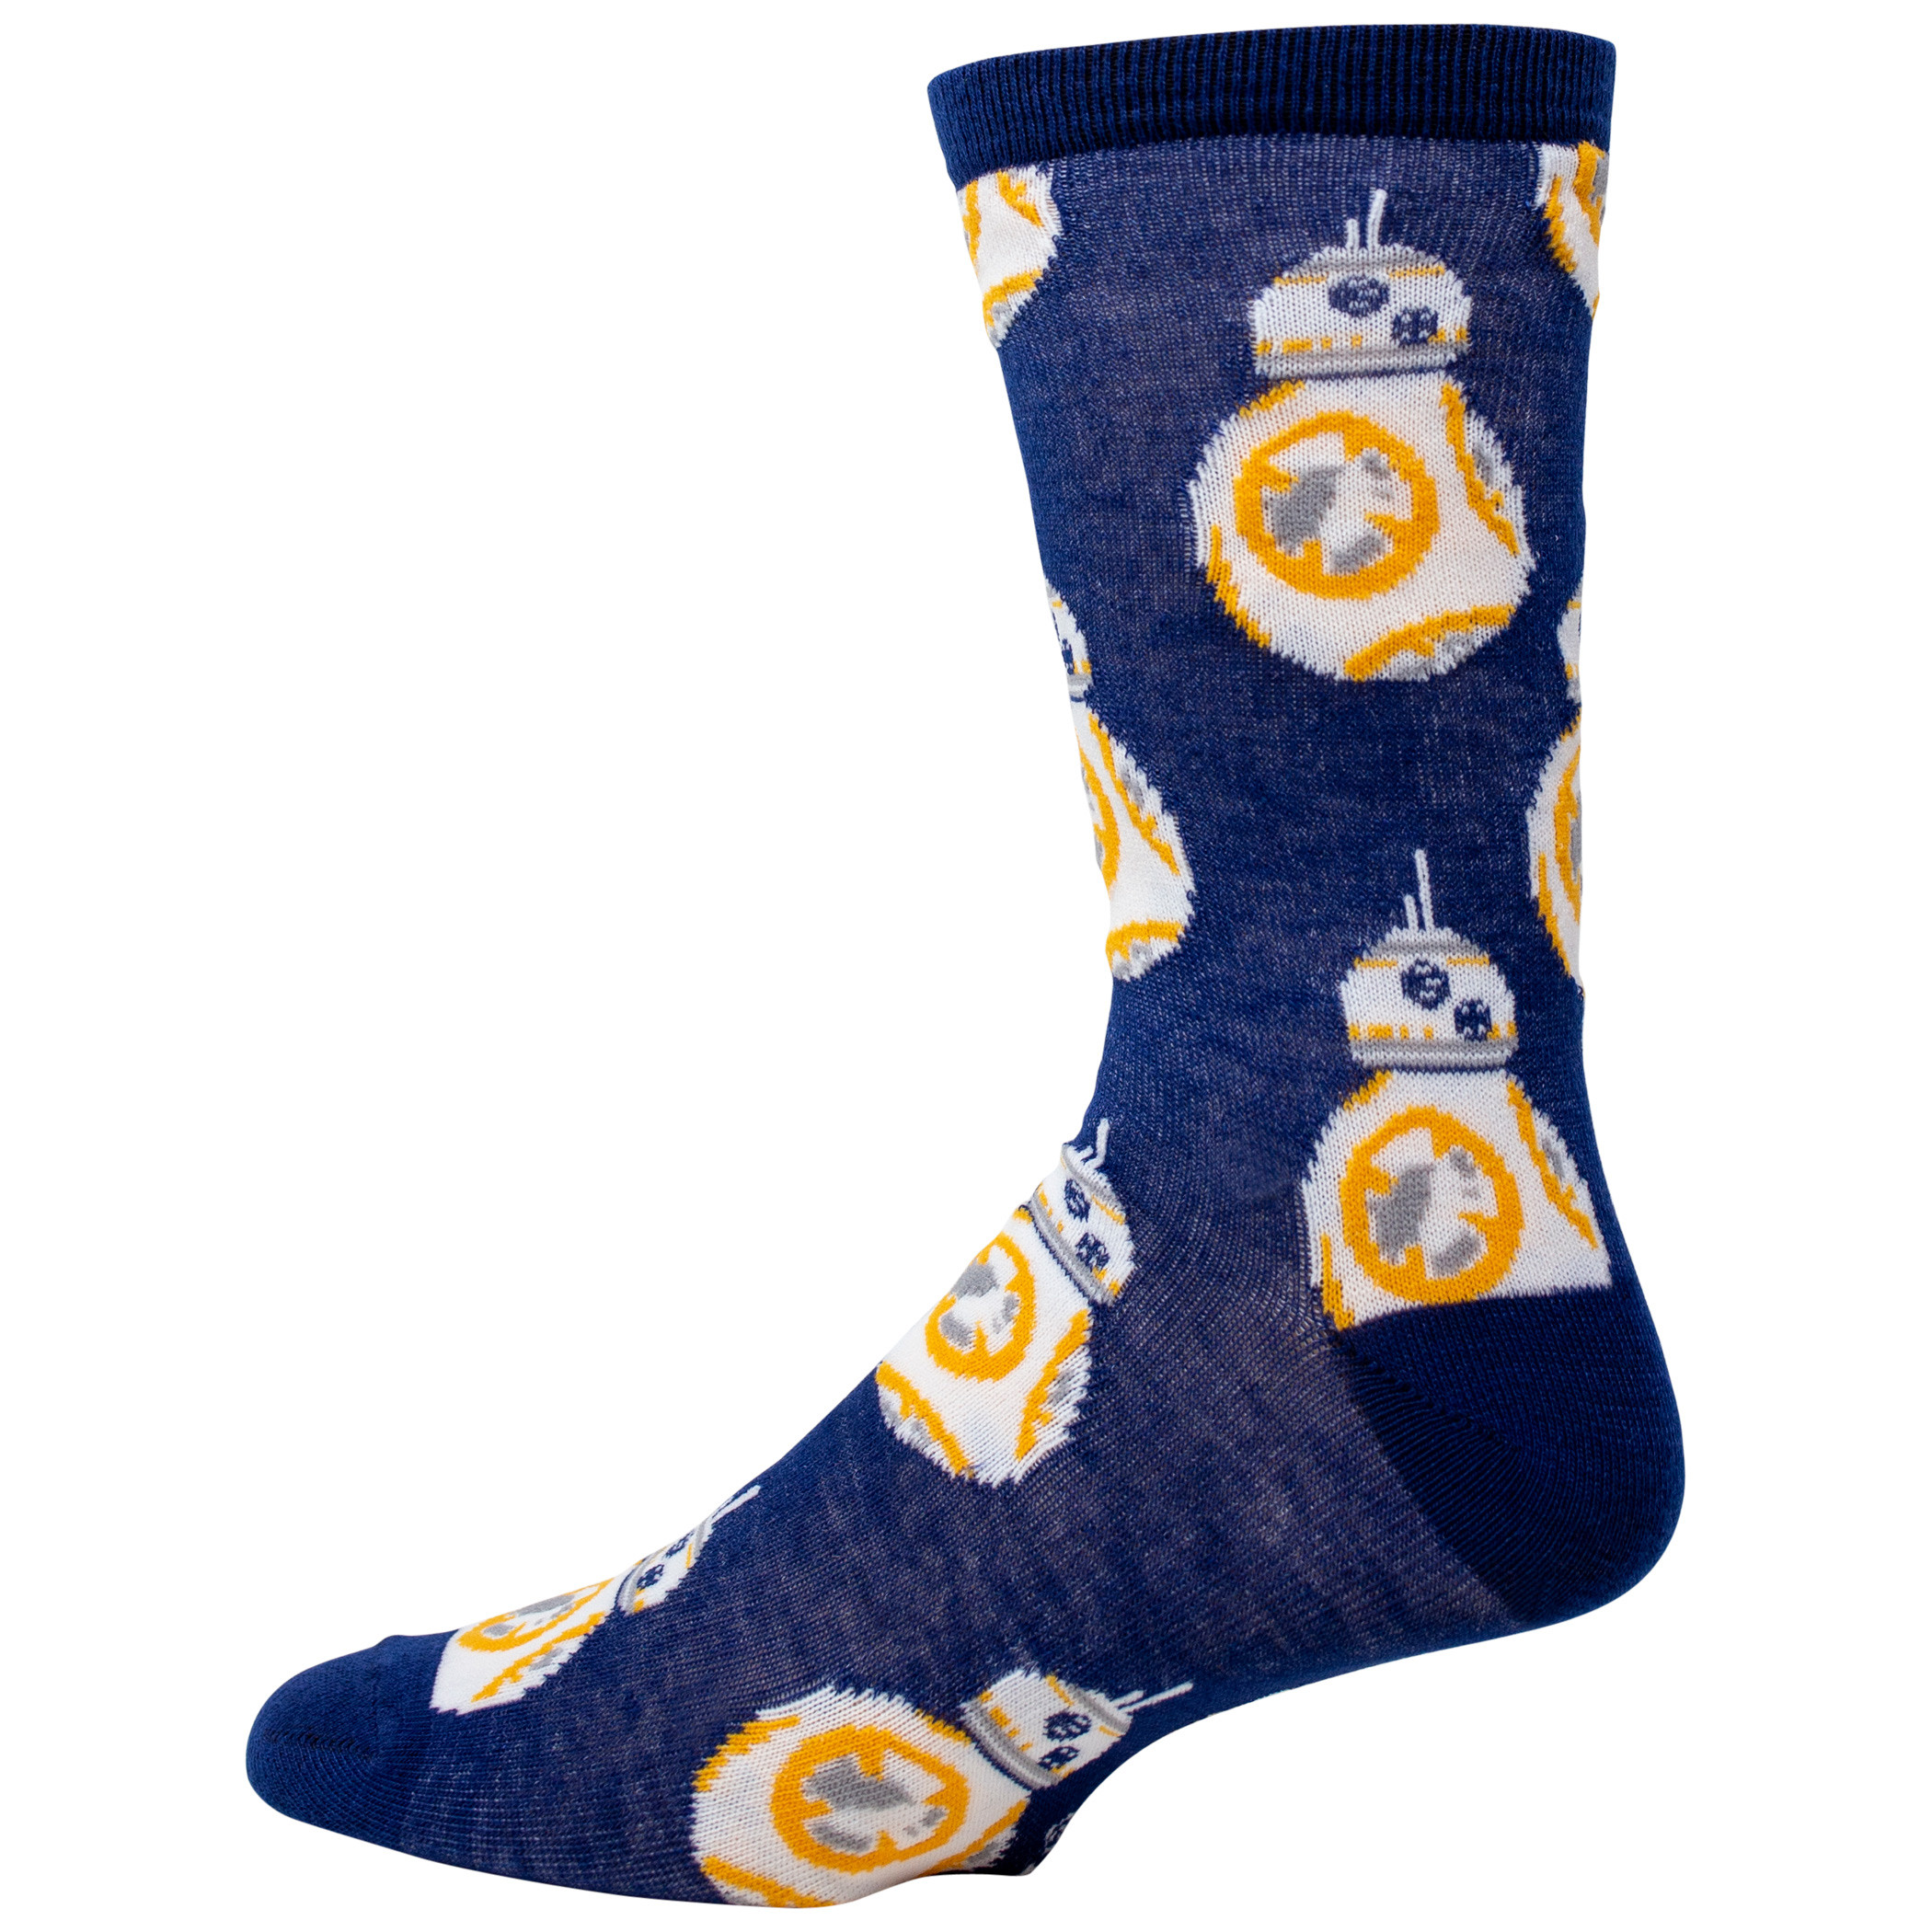 Star Wars BB-8 All Over Print Crew Socks